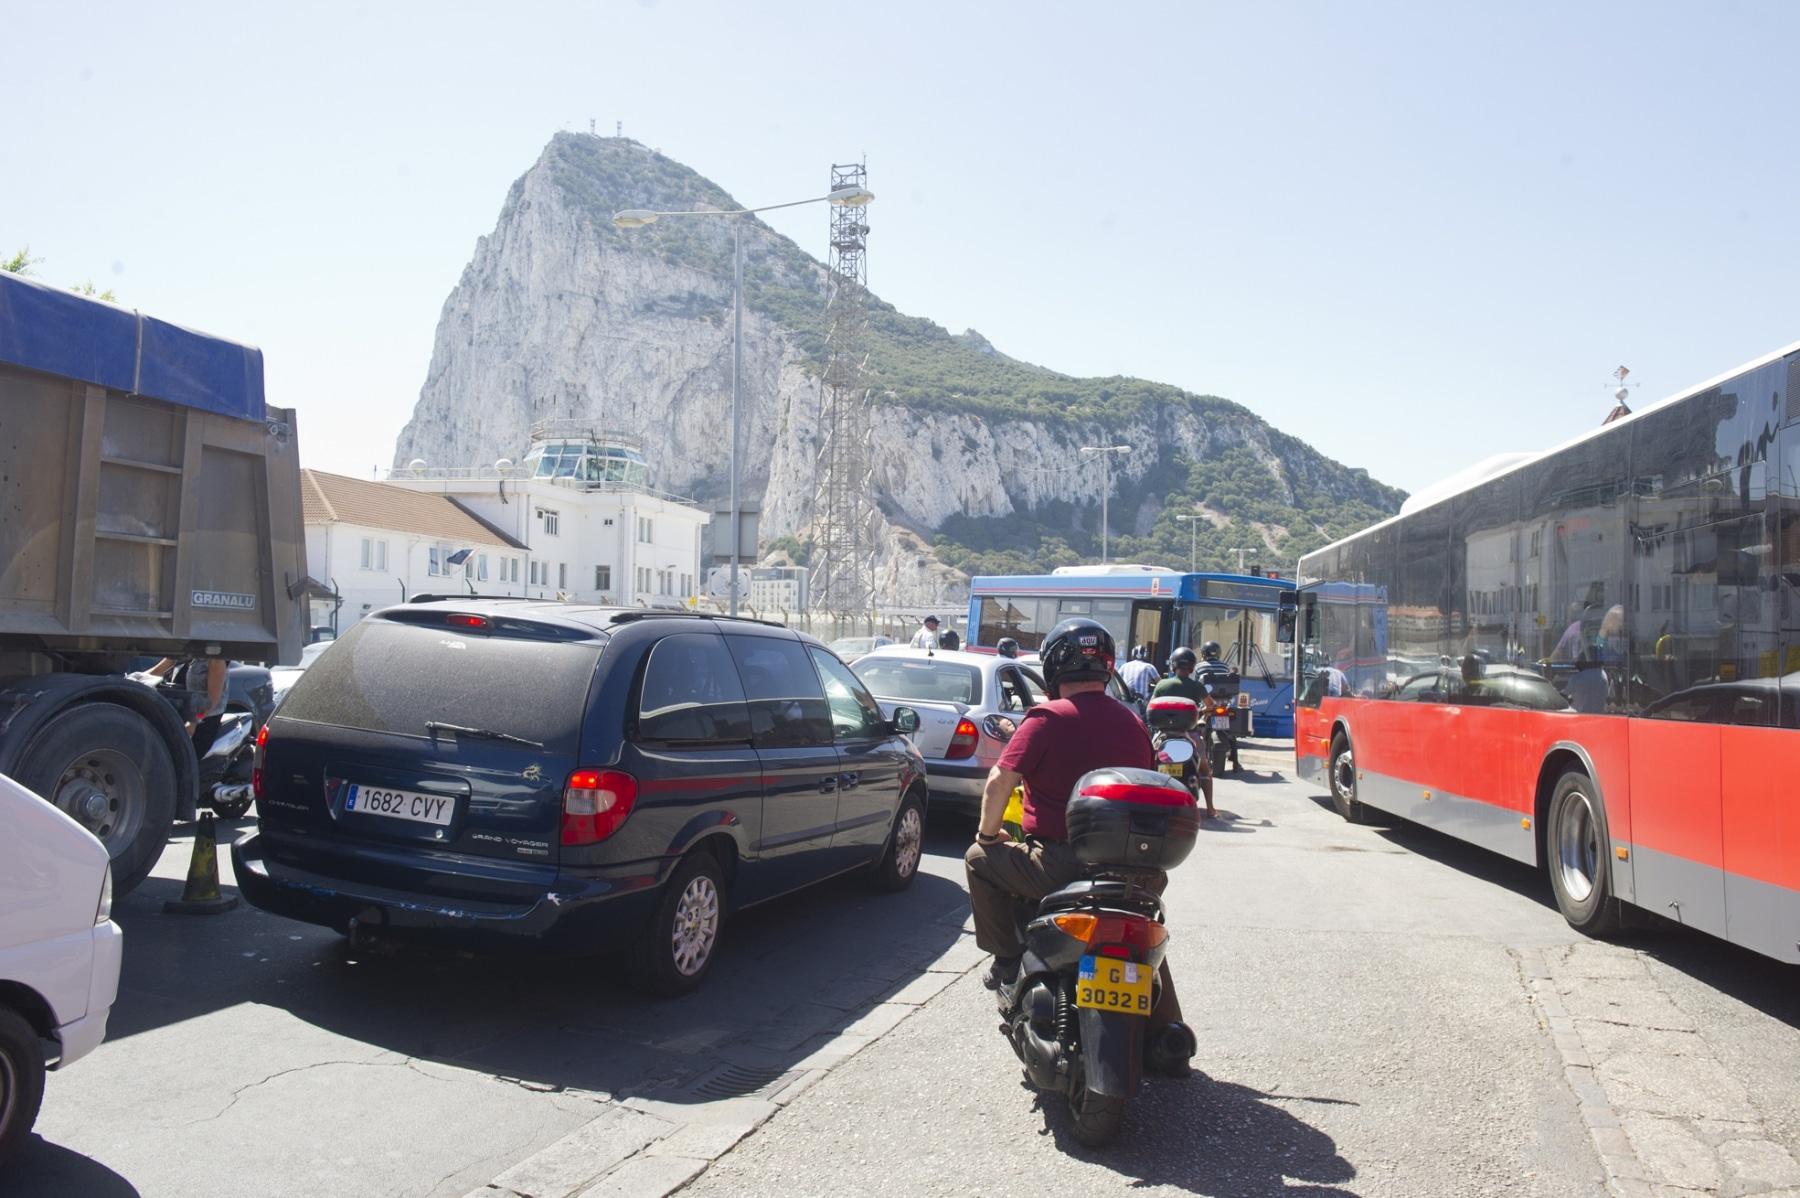 21-agosto-2014-colas-de-entrada-y-salida-de-gibraltar08_14803083960_o